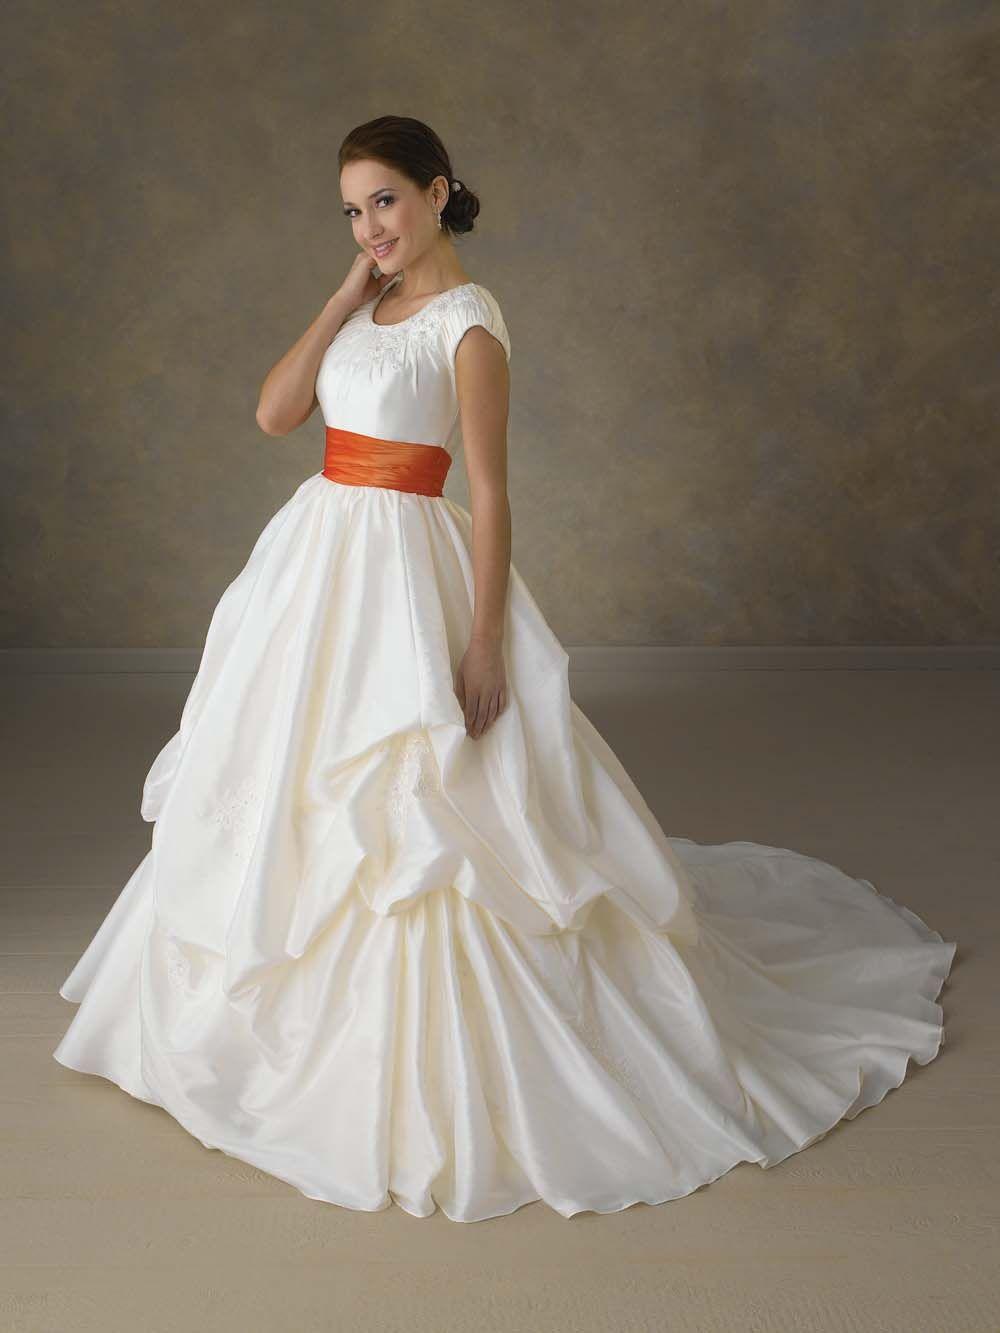 wedding dresses with orange sashes   Bonny+Wedding+Gown ...  wedding dresses...